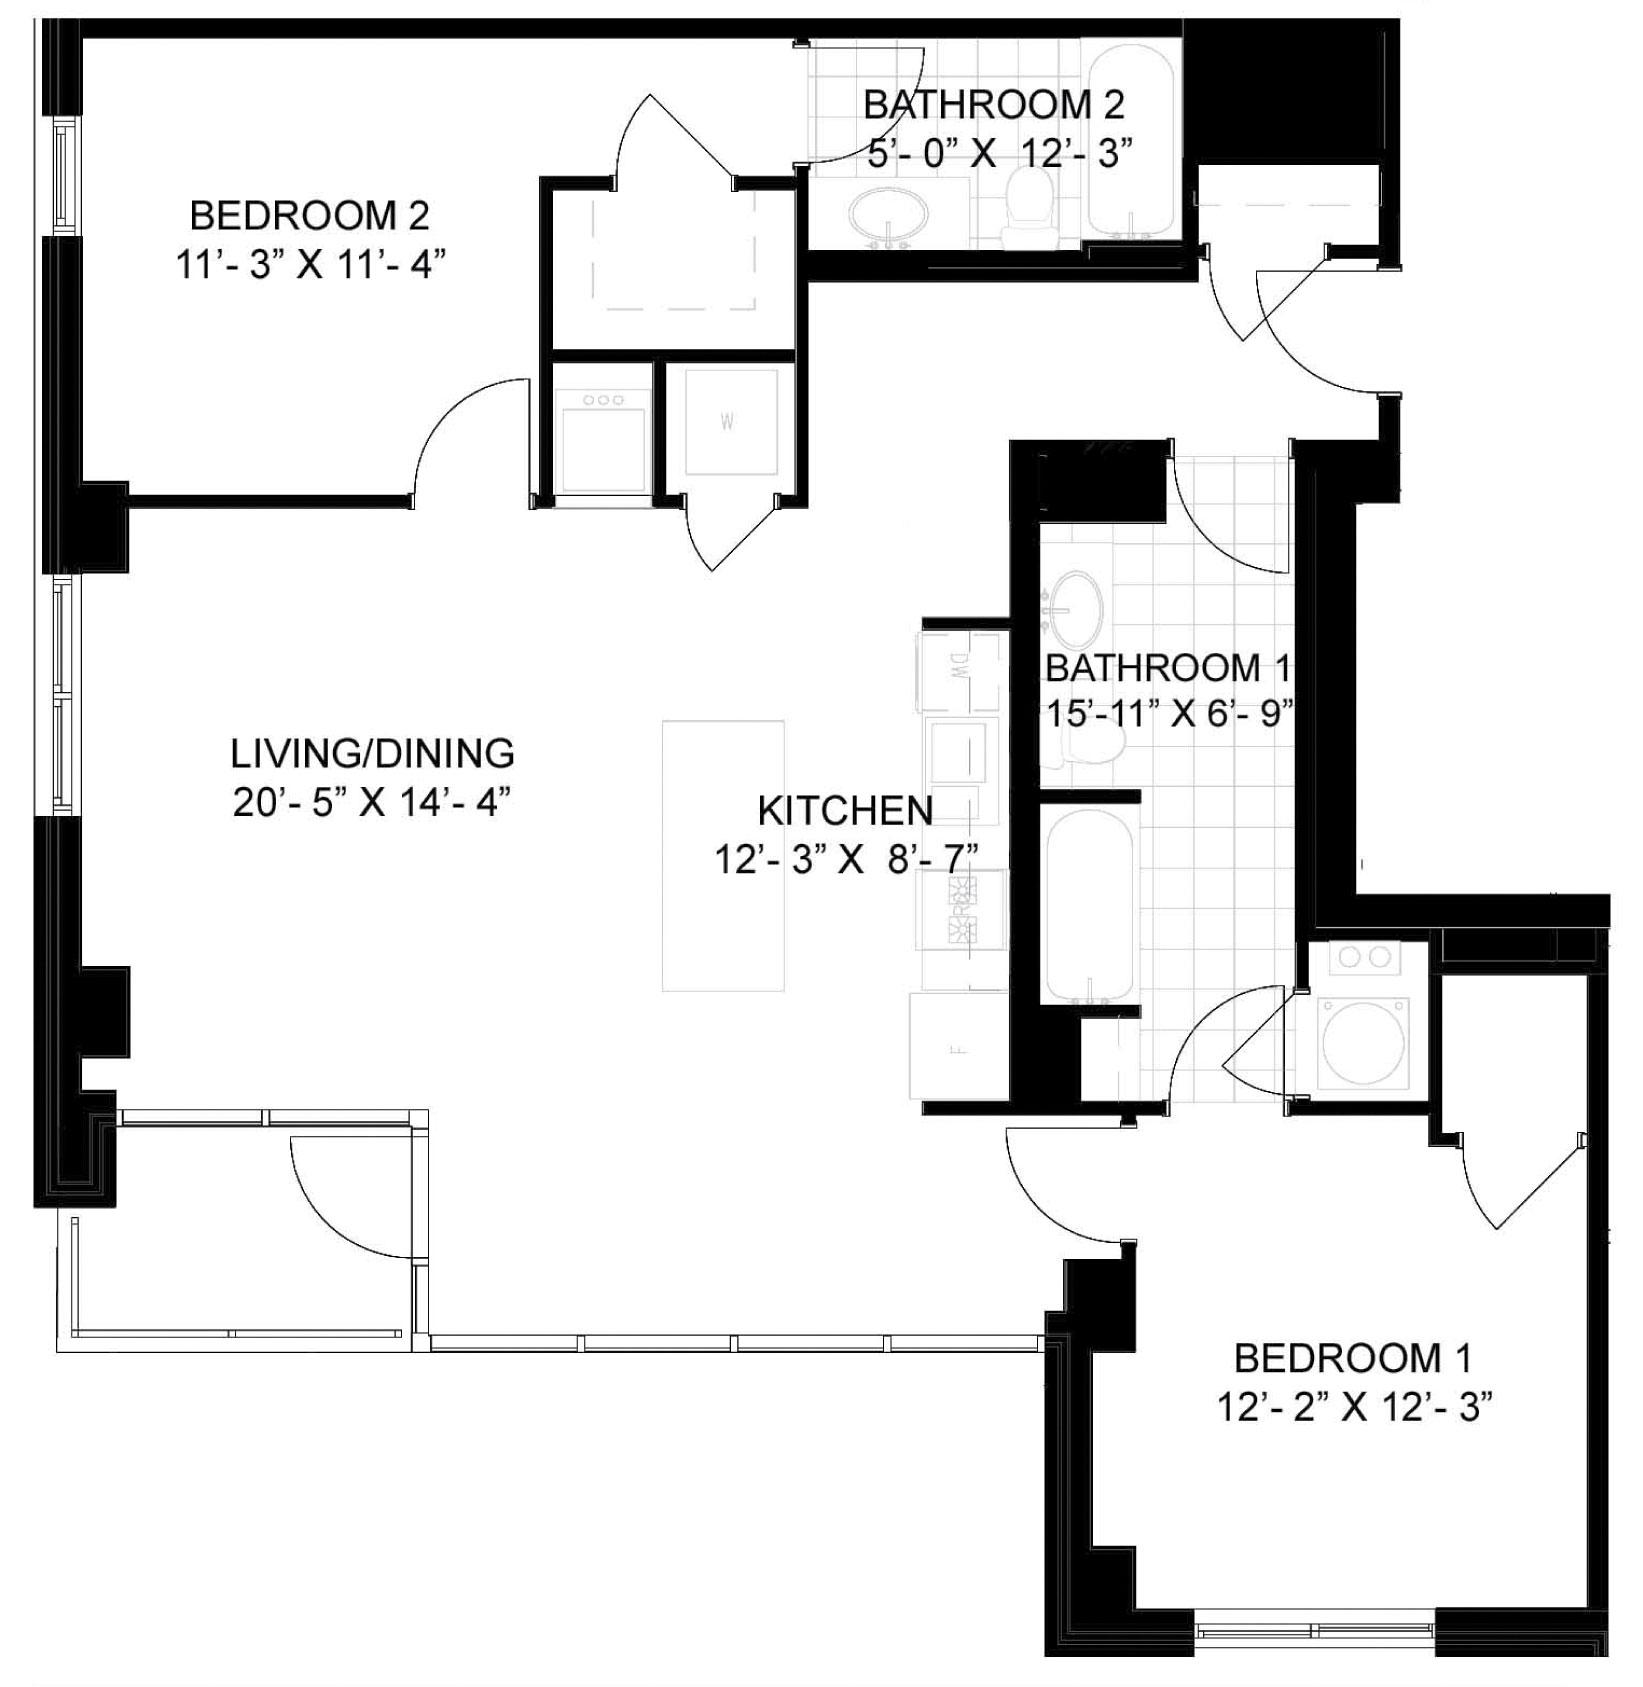 P0578522 751bc06 lakehouse c05 302 1065